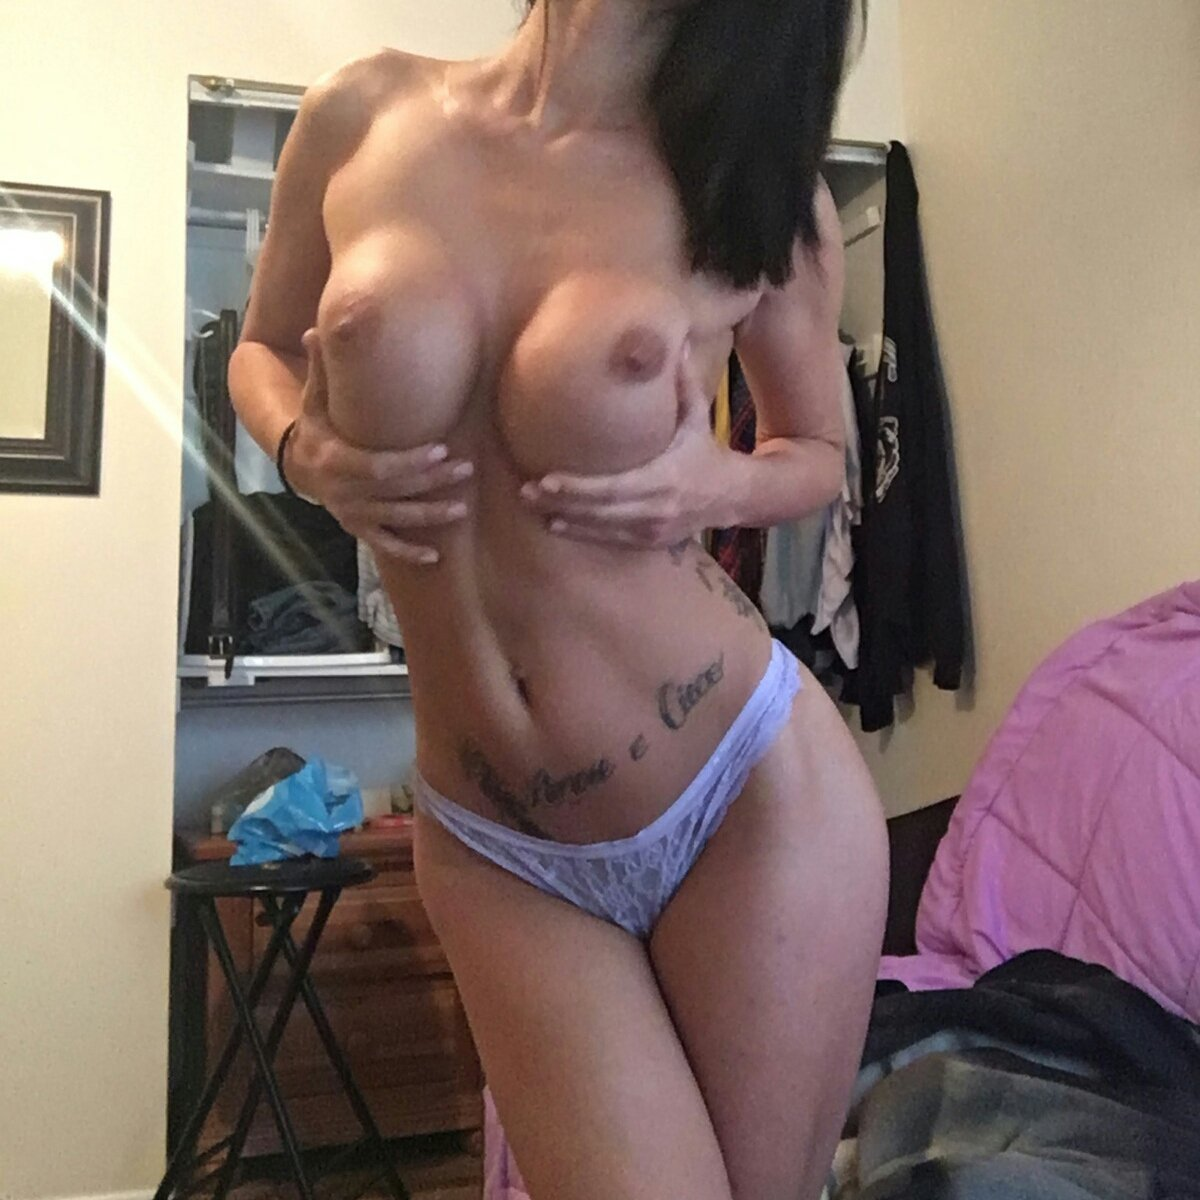 Nude Selfie 3286